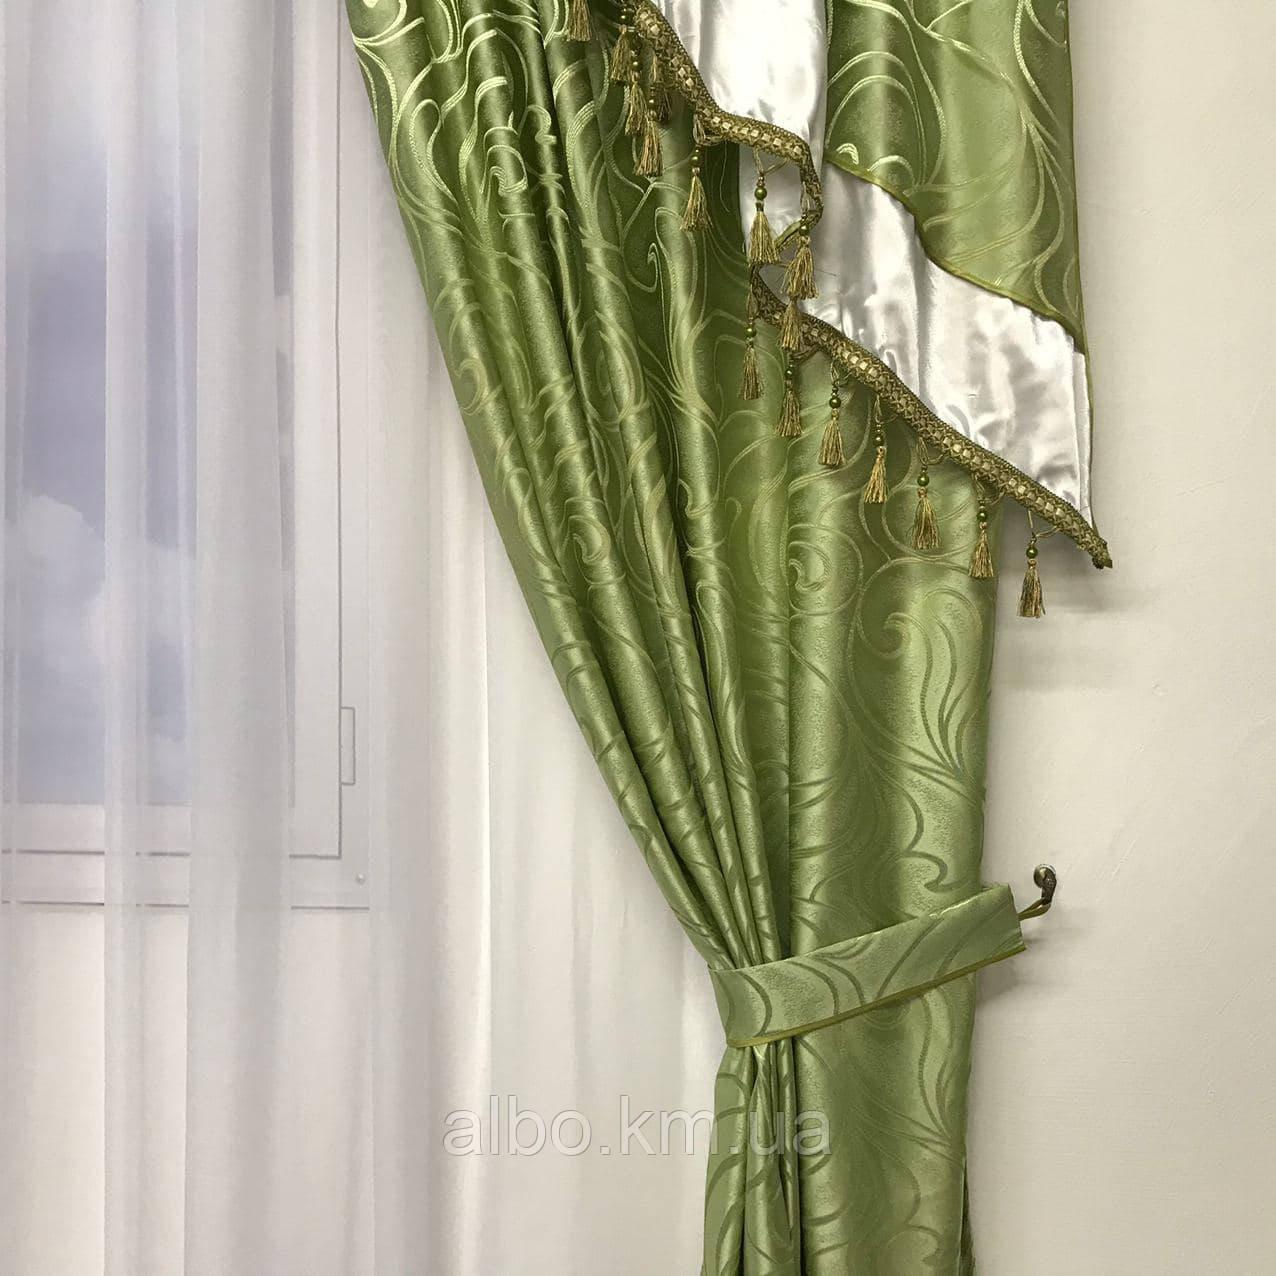 Шторы для зала жаккард 150х270 cm (2 шт) с ламбрекеном ALBO зелений (LS240-29)